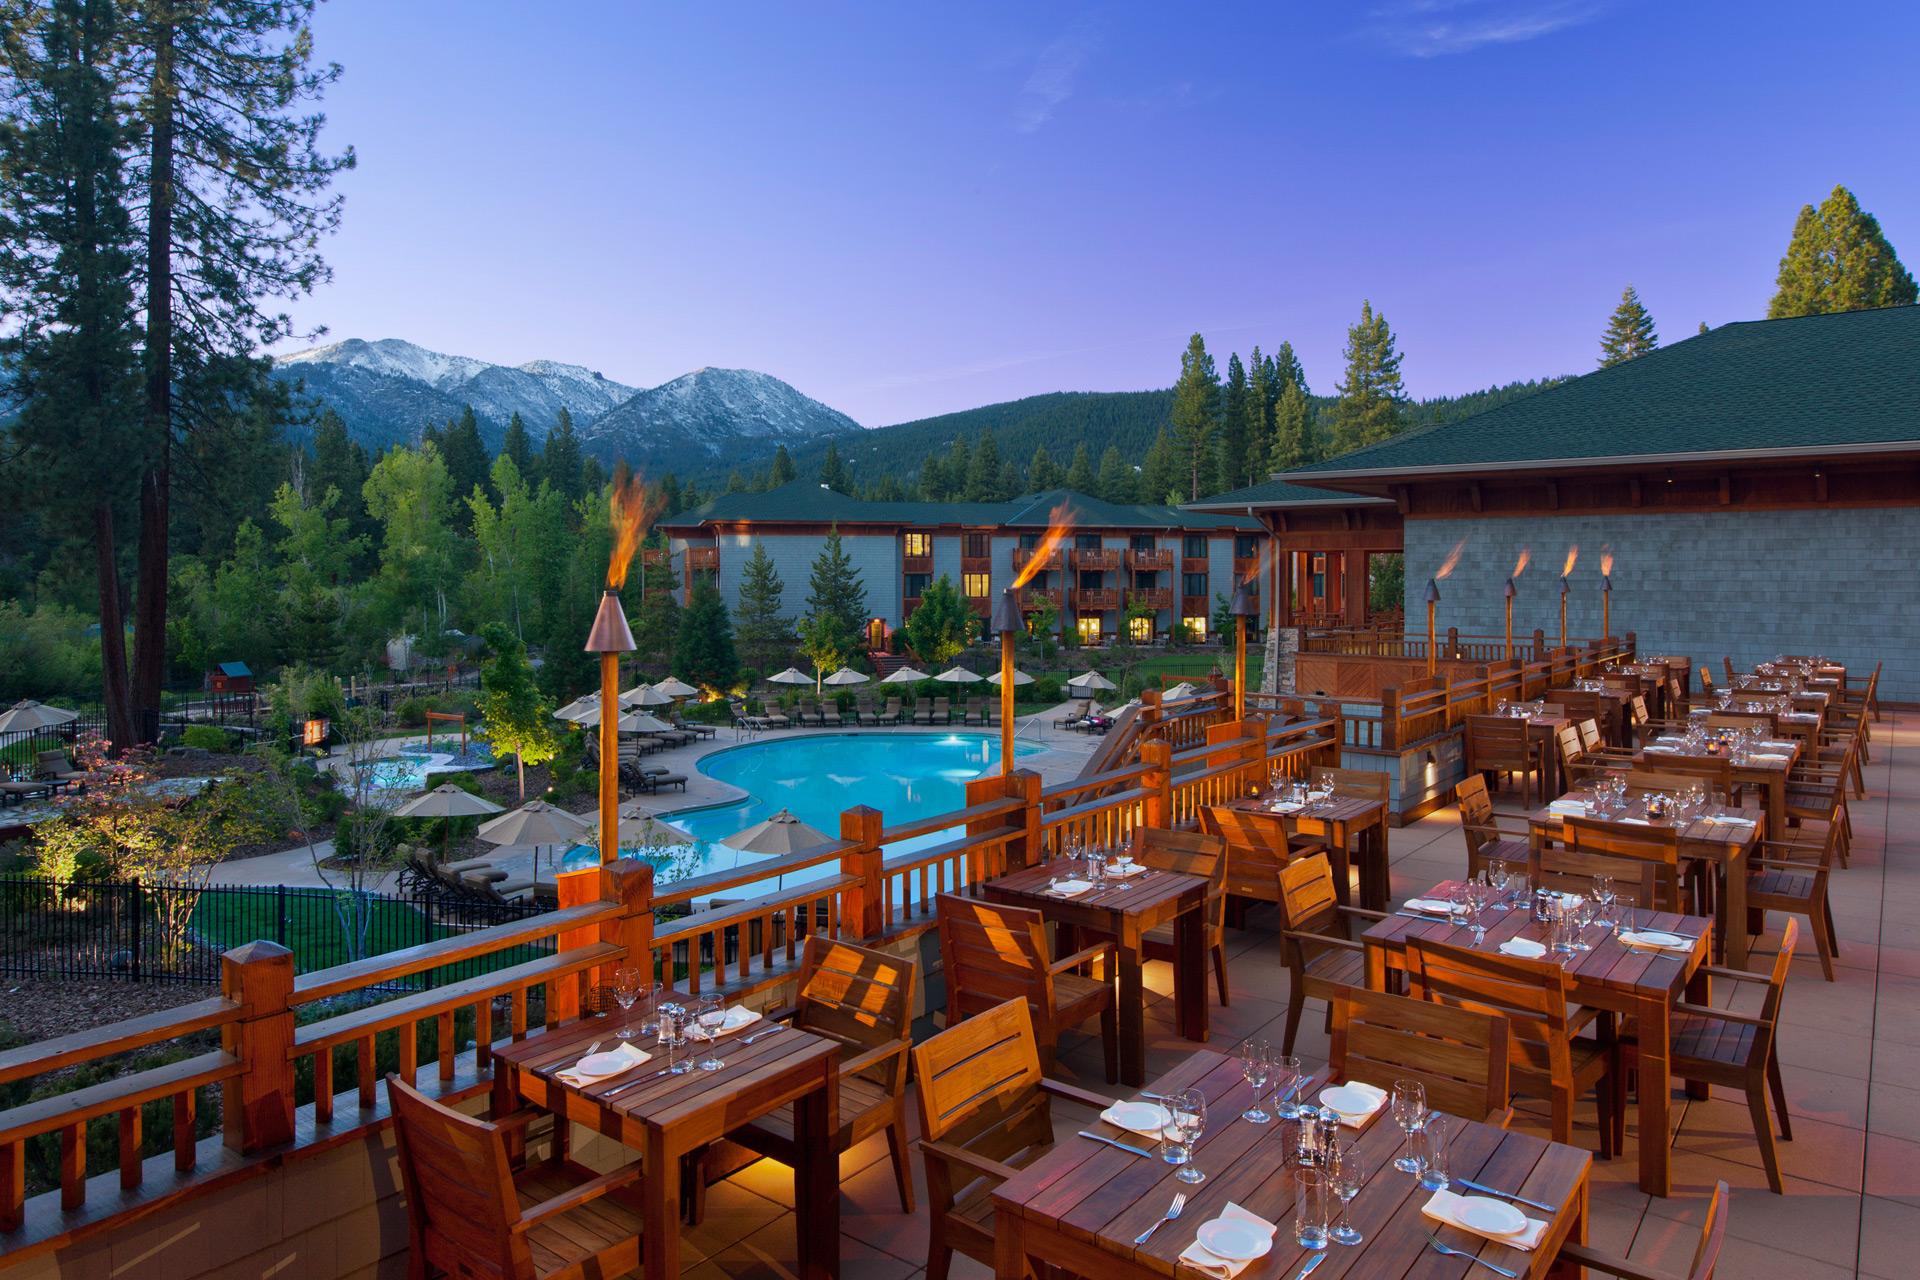 Sierra Café restaurant designer